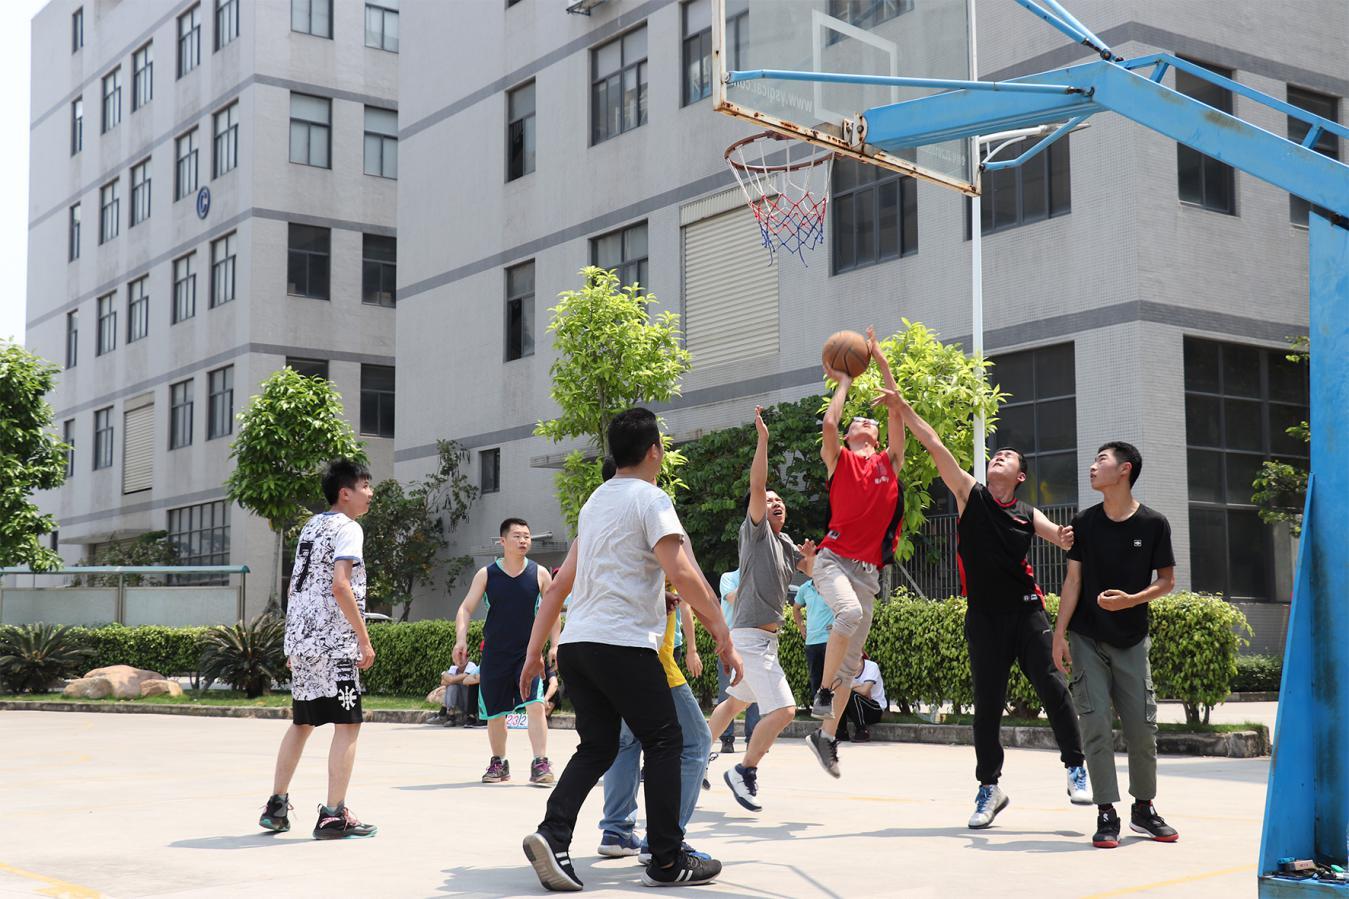 make-sports-meet-full-fitness-happy-work-and-healthy-life-basket.jpg